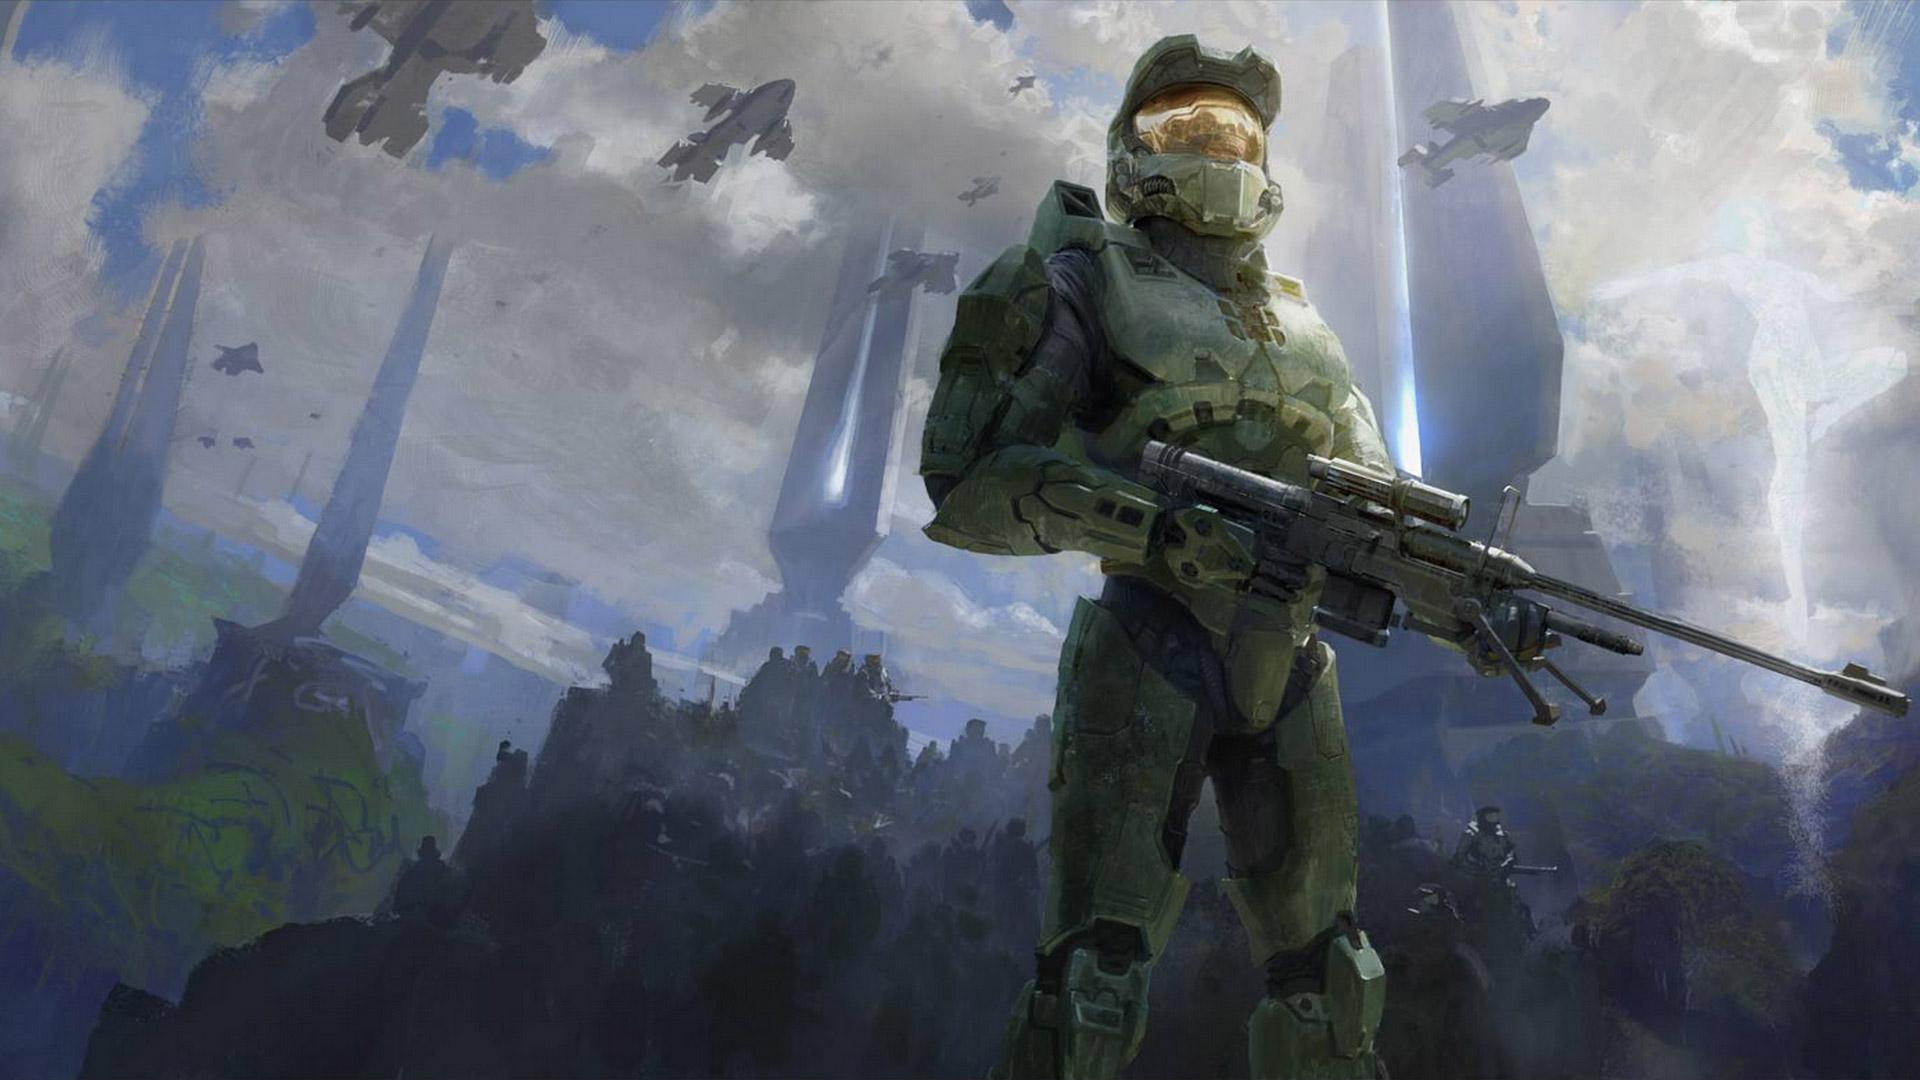 Halo 3 Wallpaper in 1920x1080